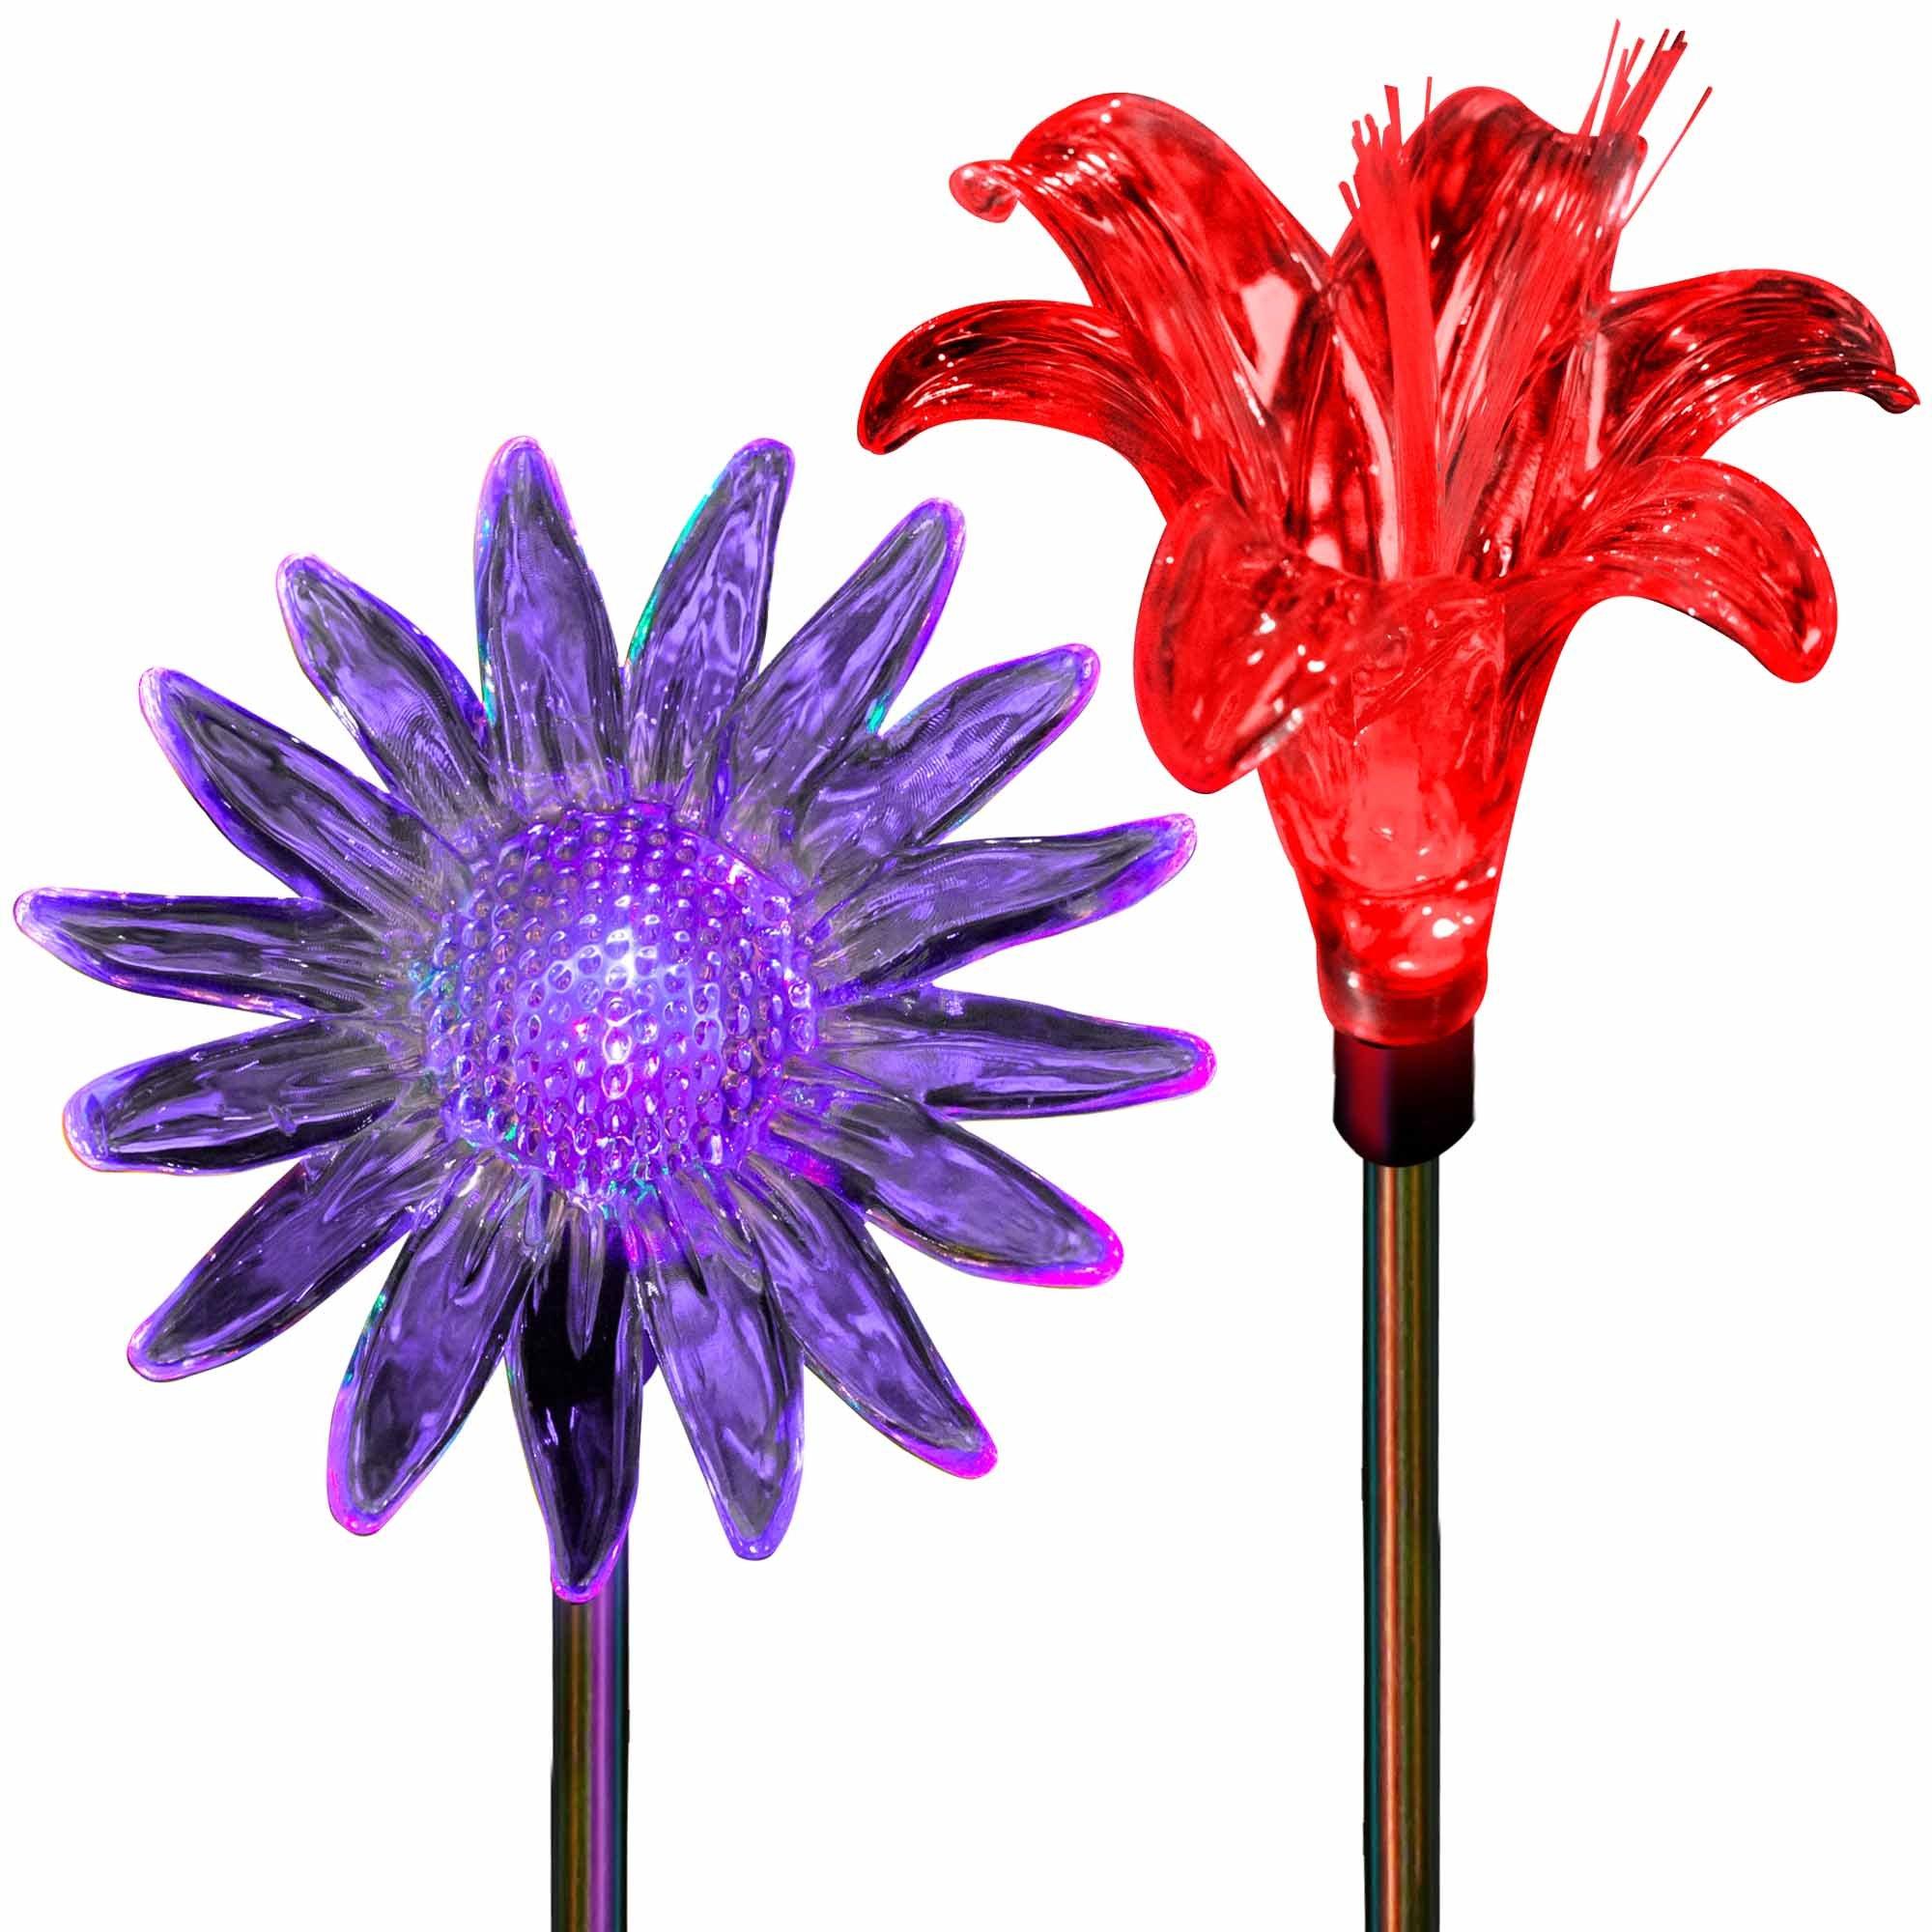 SolarDuke Solar Garden Outdoor Flower Stake Lights Color Changing Sunflower Lily Flower for Garden Patio Decor